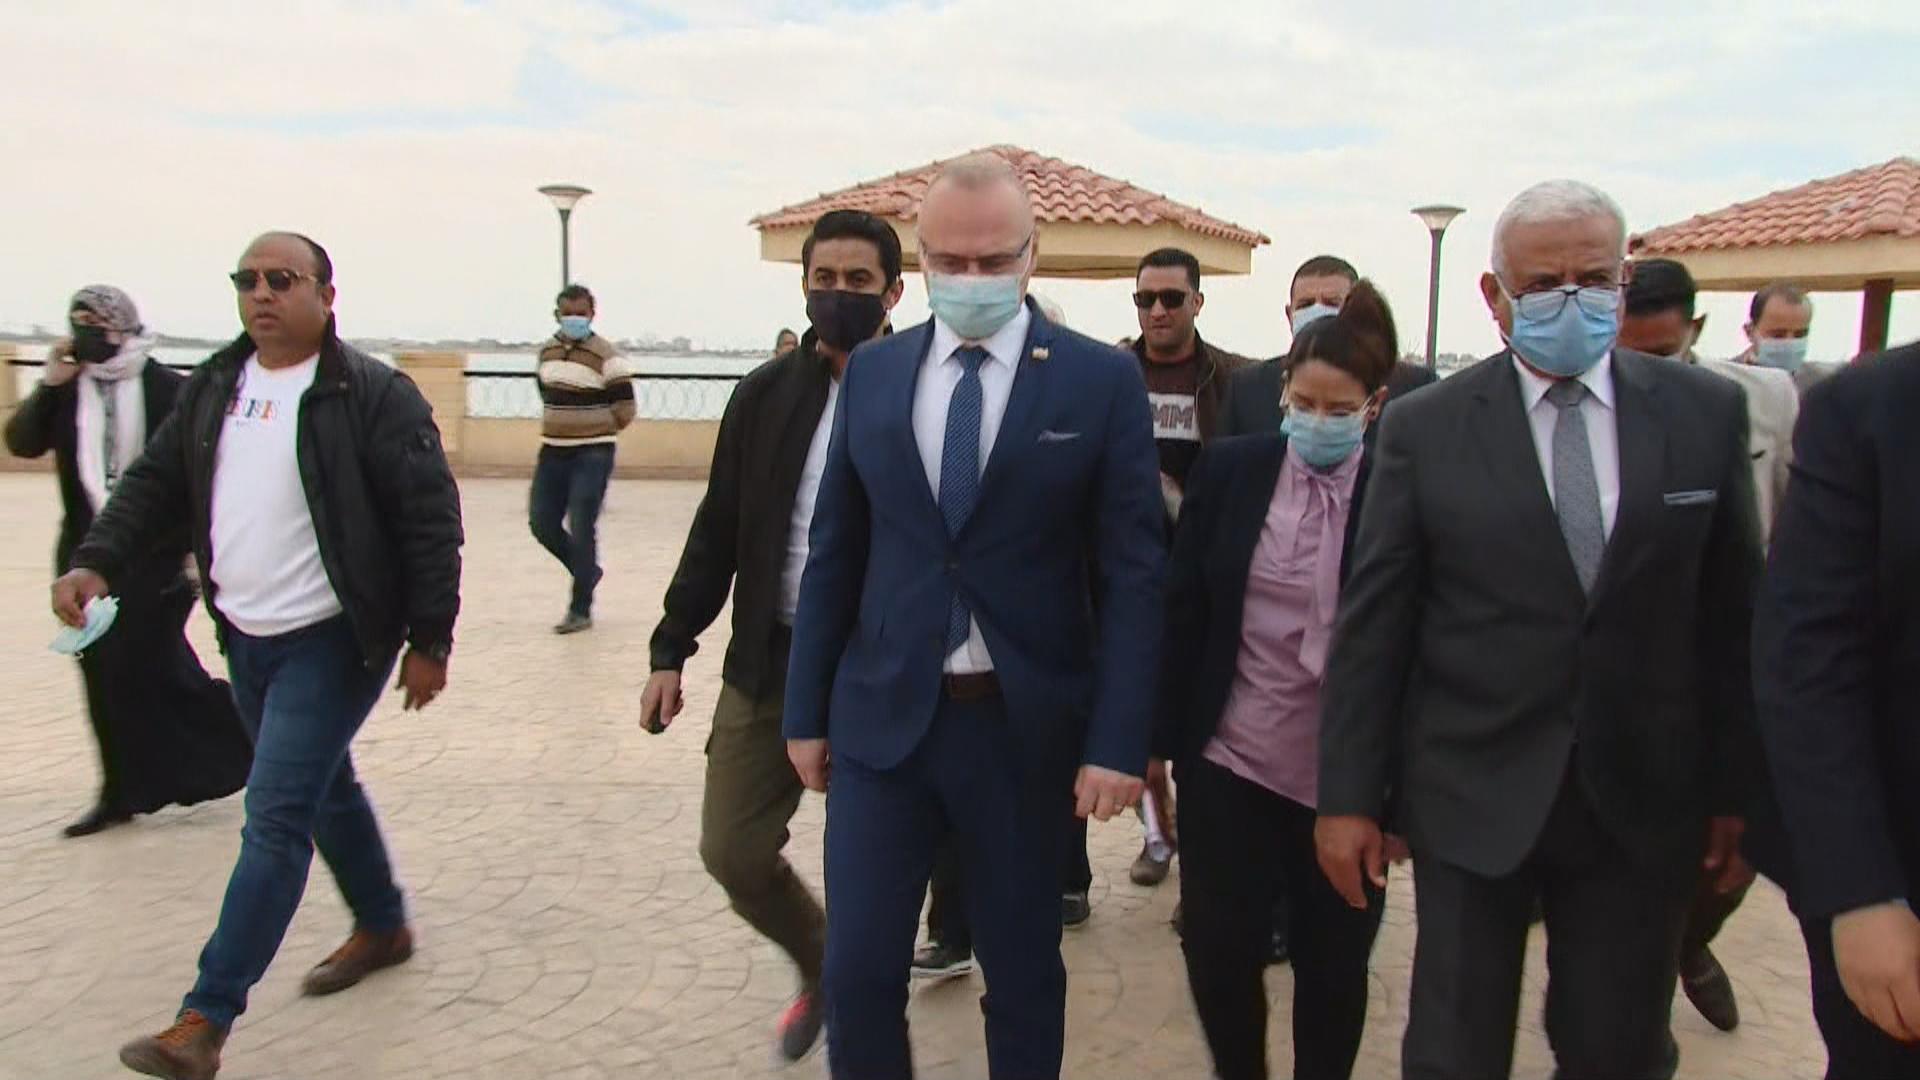 Croatia: Grlić Radman on an official visit to Egypt